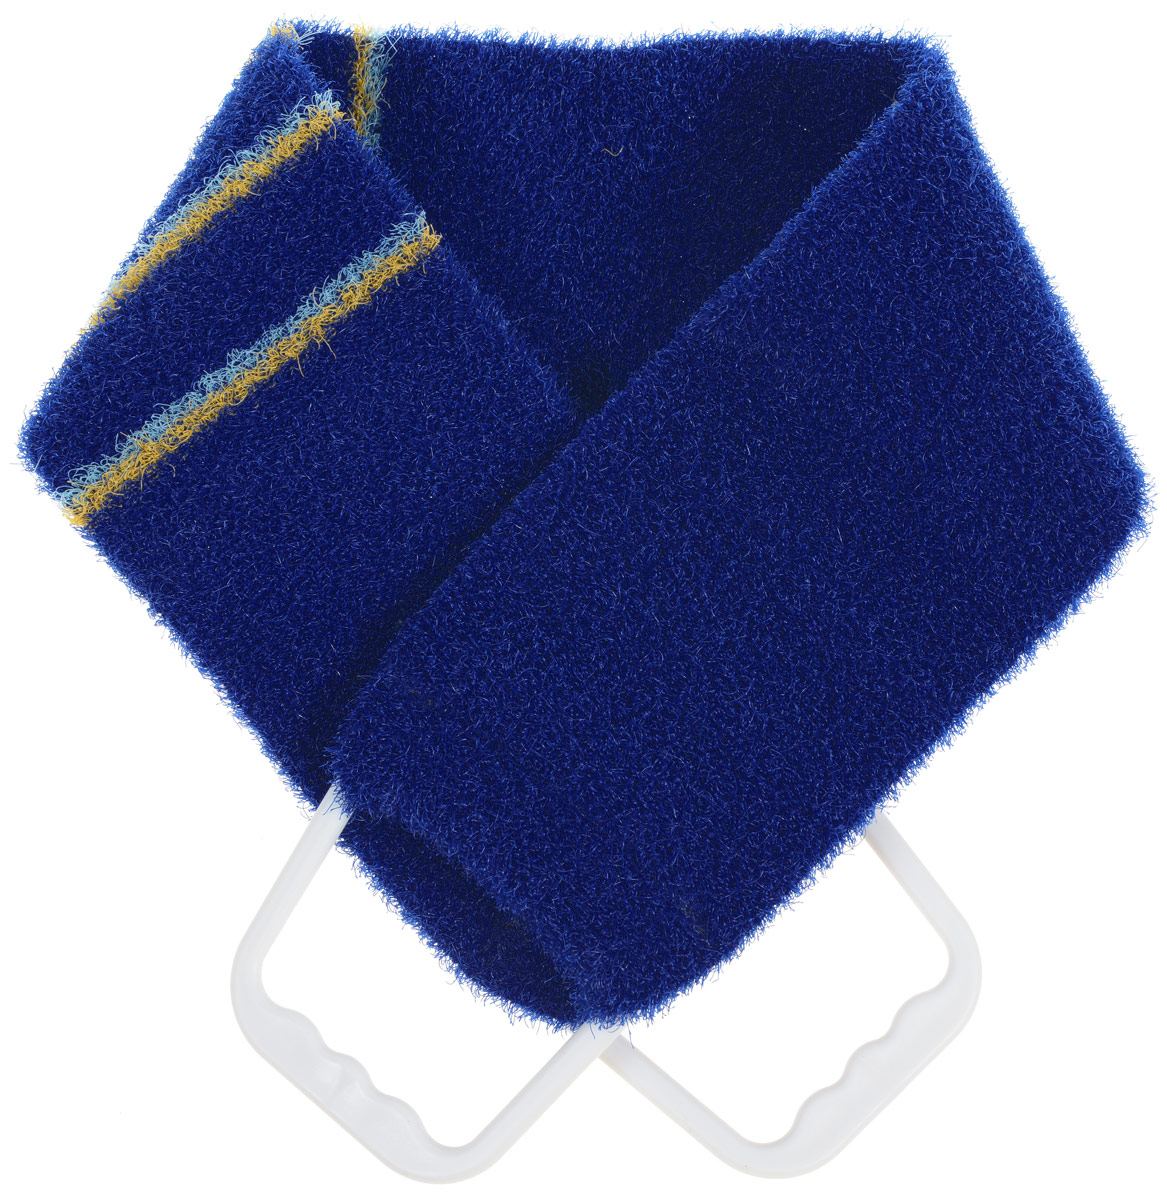 Мочалка-пояс массажная Riffi, жесткая, цвет: темно-синий, 80 х 11 см riffi мочалка пояс массажная жесткая цвет коралловый